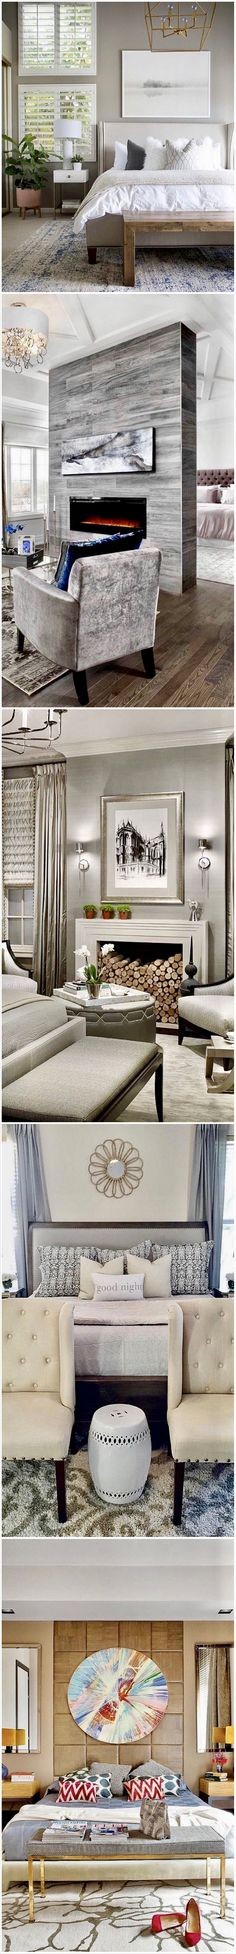 Grey in the Master bedroom